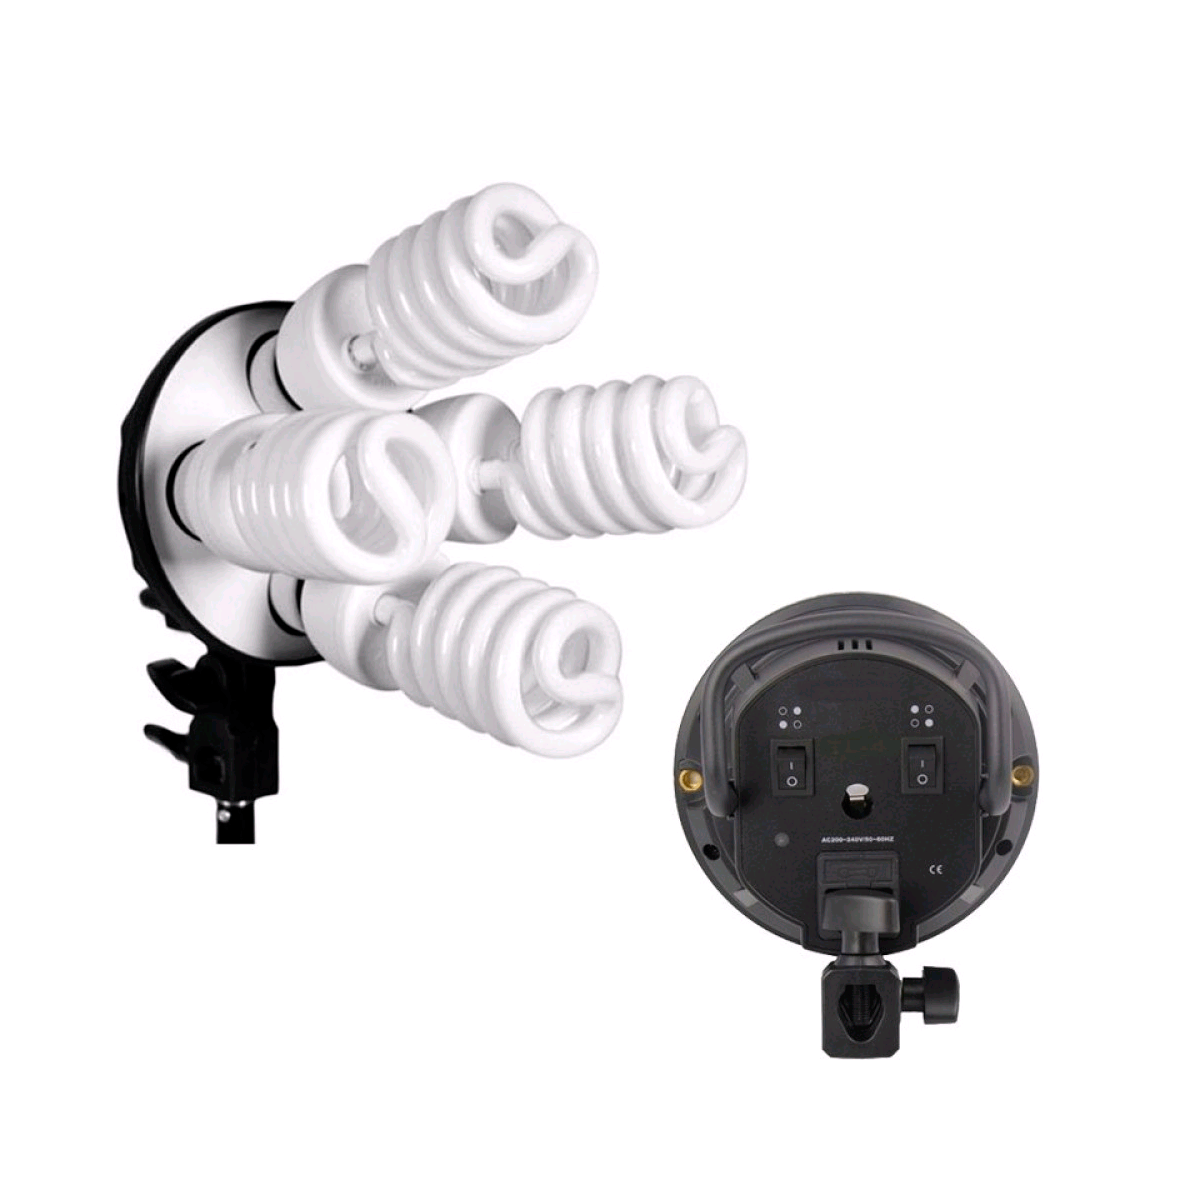 Kit de Iluminação Greika PK-SB03 para Estúdio Fotográfico  - Fotolux